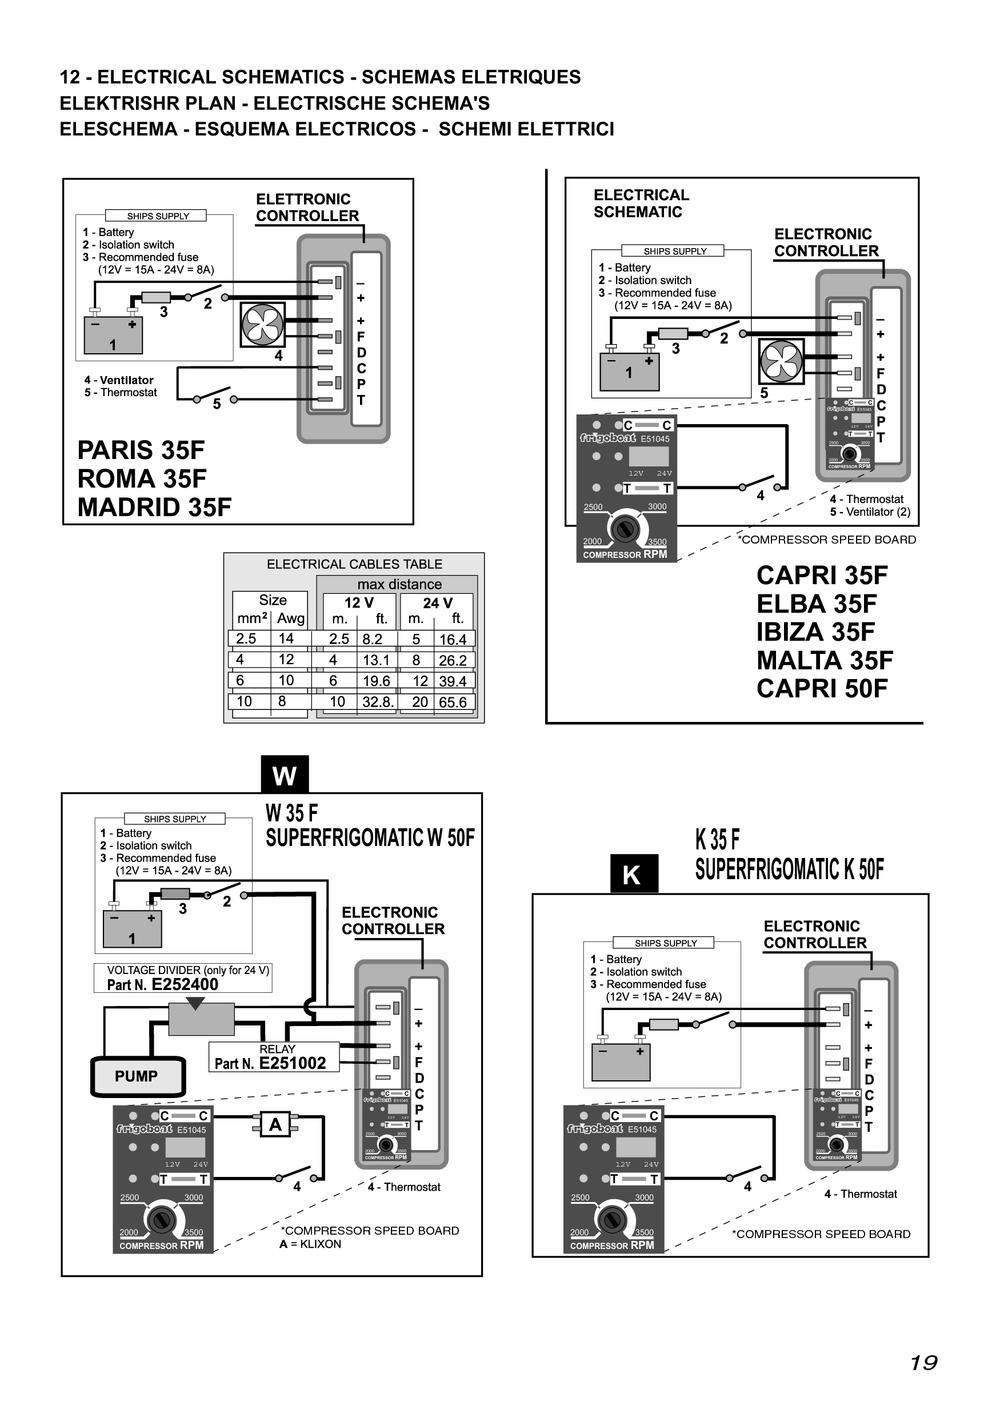 Click image for larger version  Name:frigomatic-bd-35-bd50-5024_19b.jpg Views:1421 Size:158.5 KB ID:30456